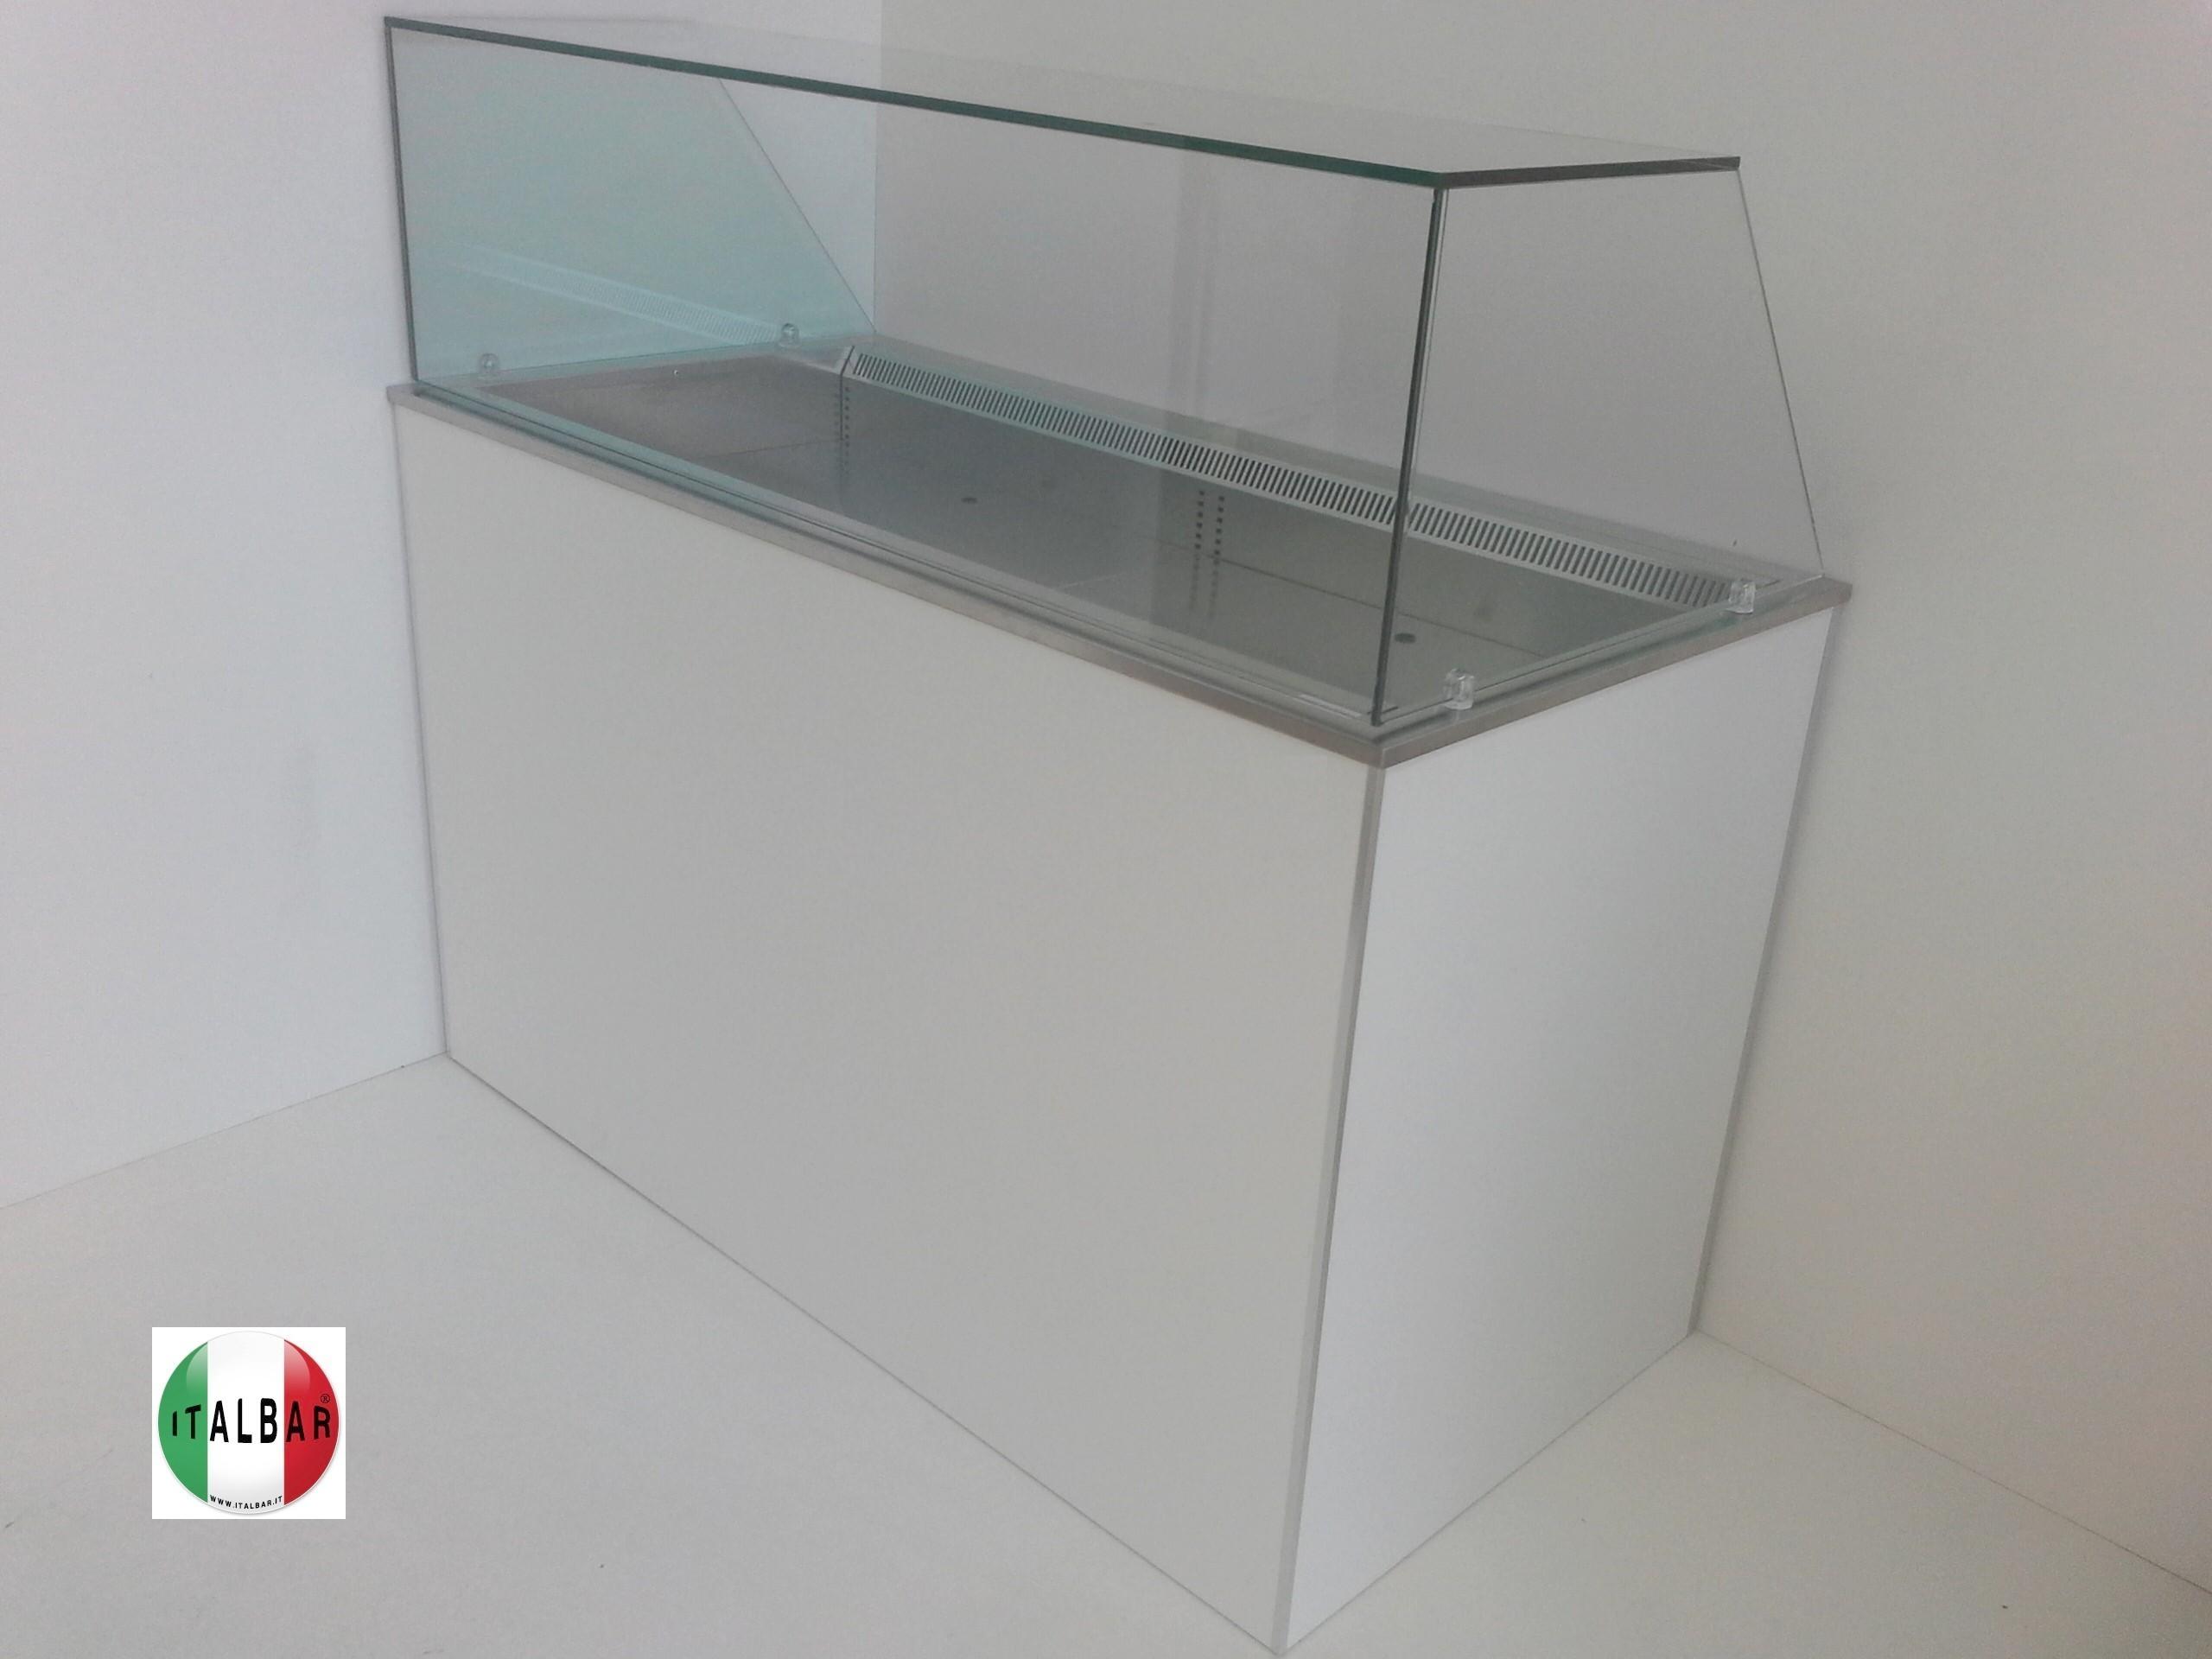 prezzi vetrine ventilate refigerate